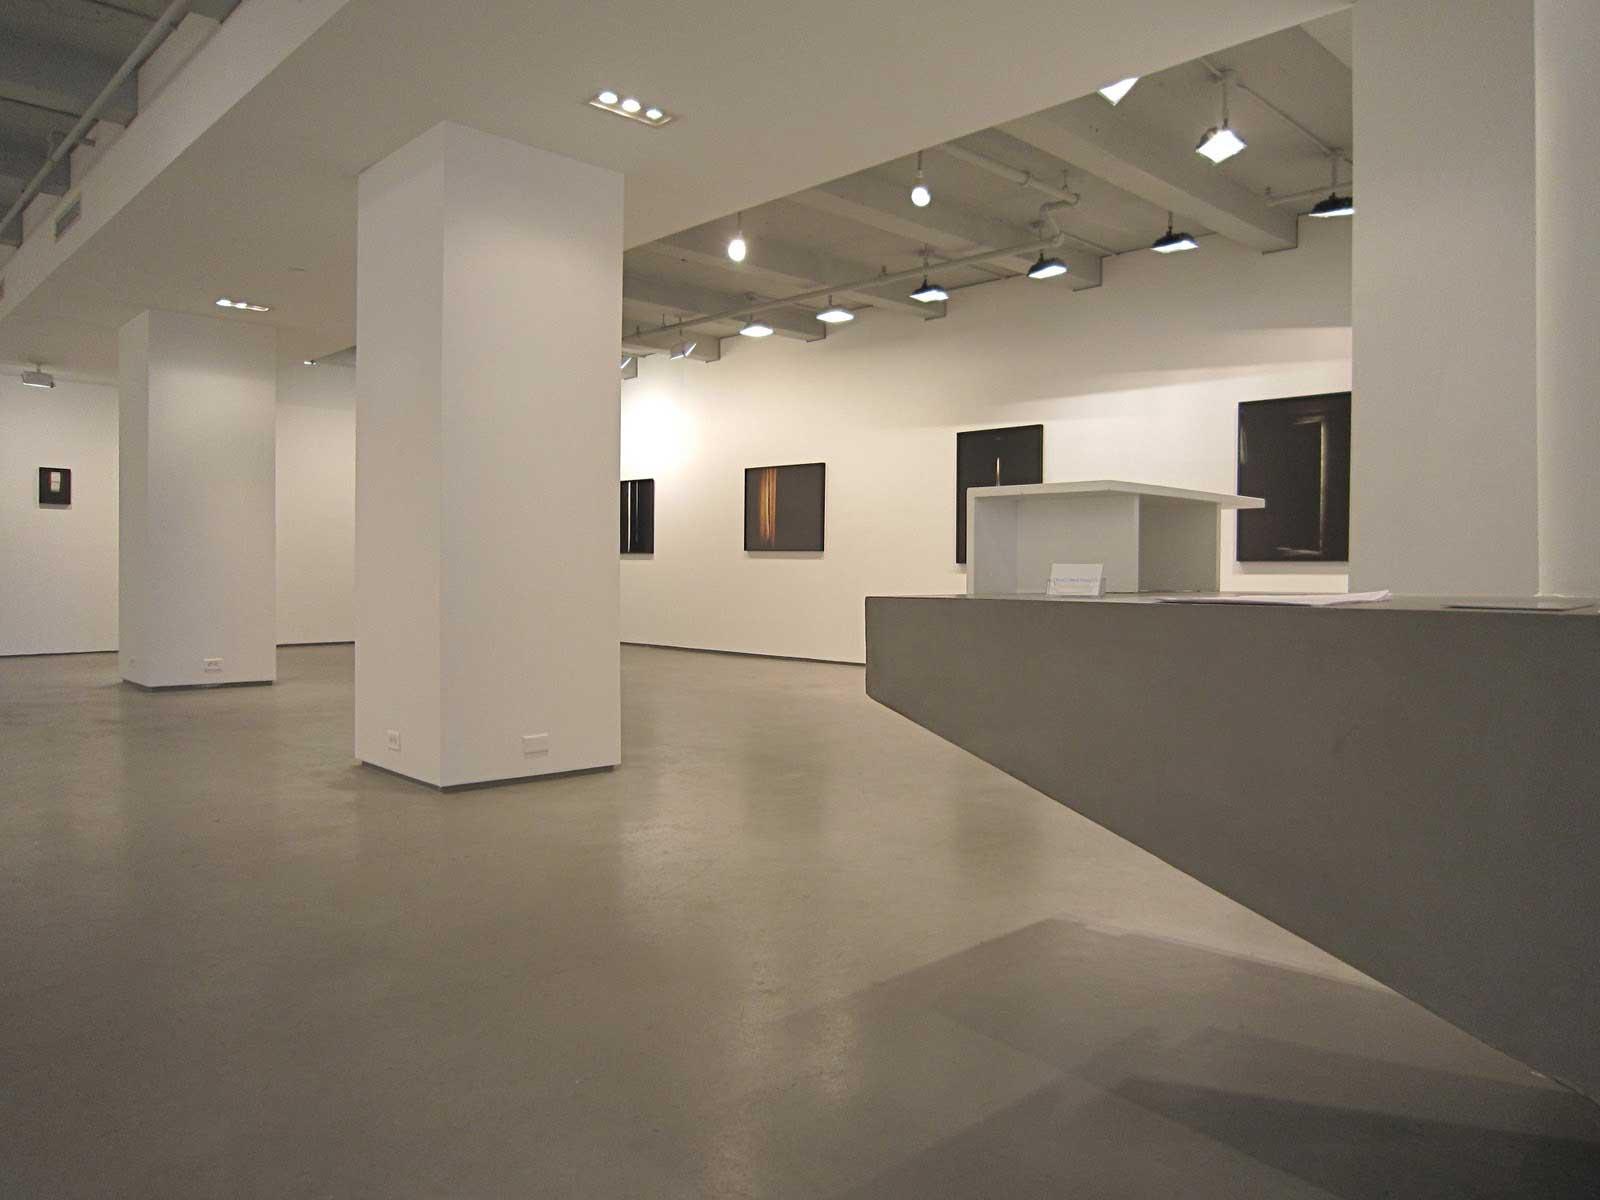 Pavimento Grigio Perla : Index of img pavimento in microcemento e resina pavimenti moderni